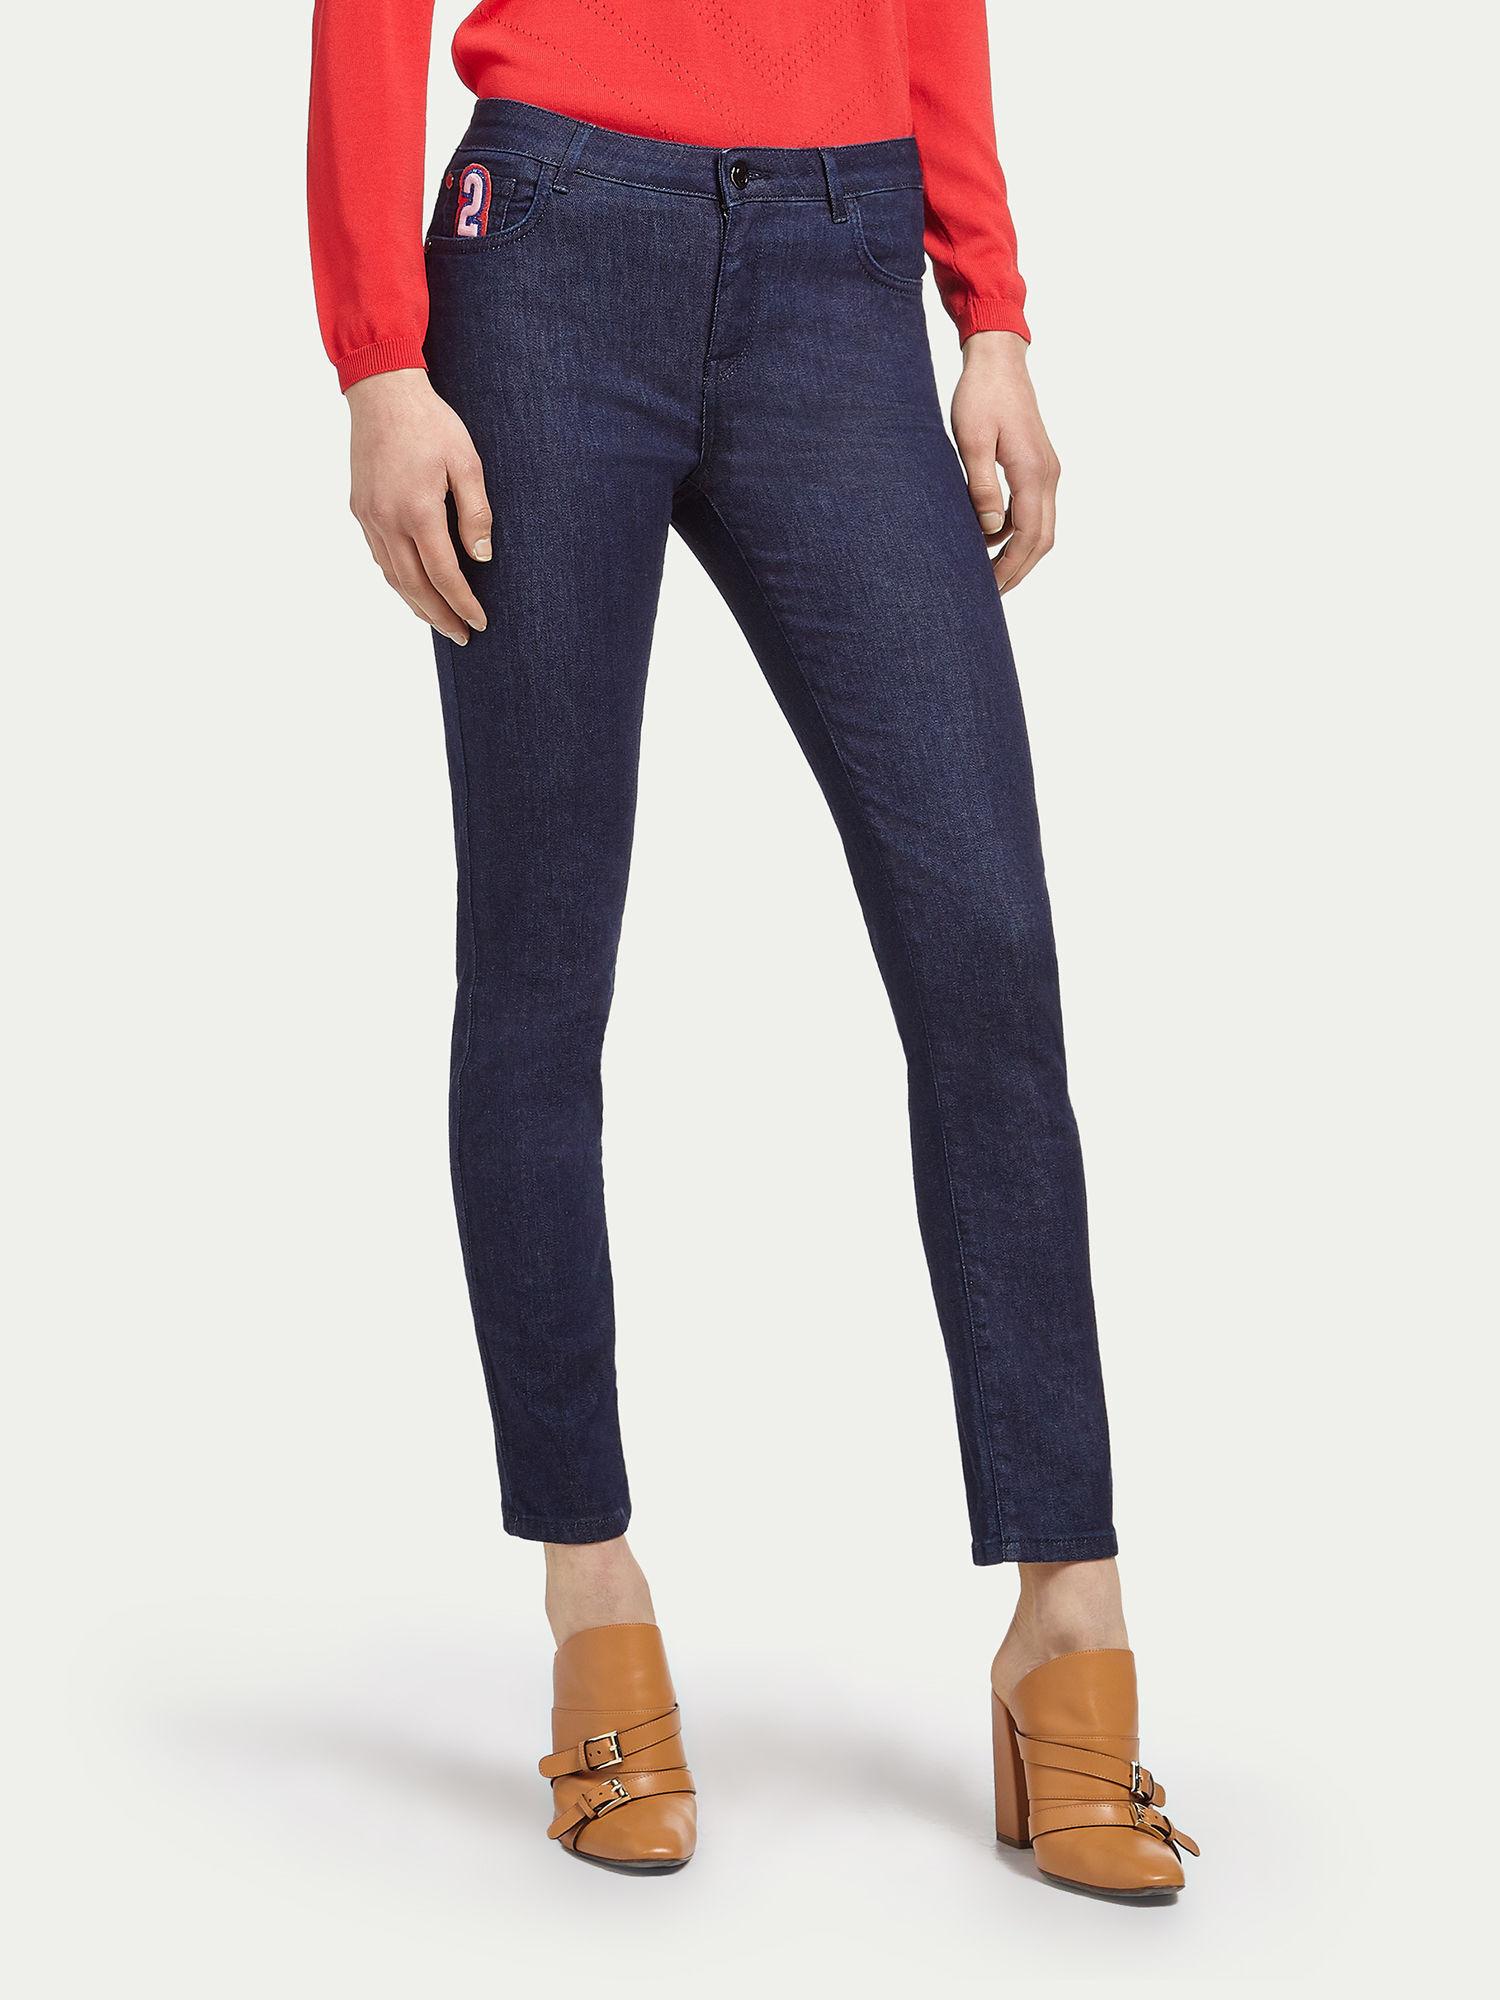 Pants for Women On Sale, Dark Blue, Cotton, 2017, 26 27 28 29 30 31 32 Trussardi